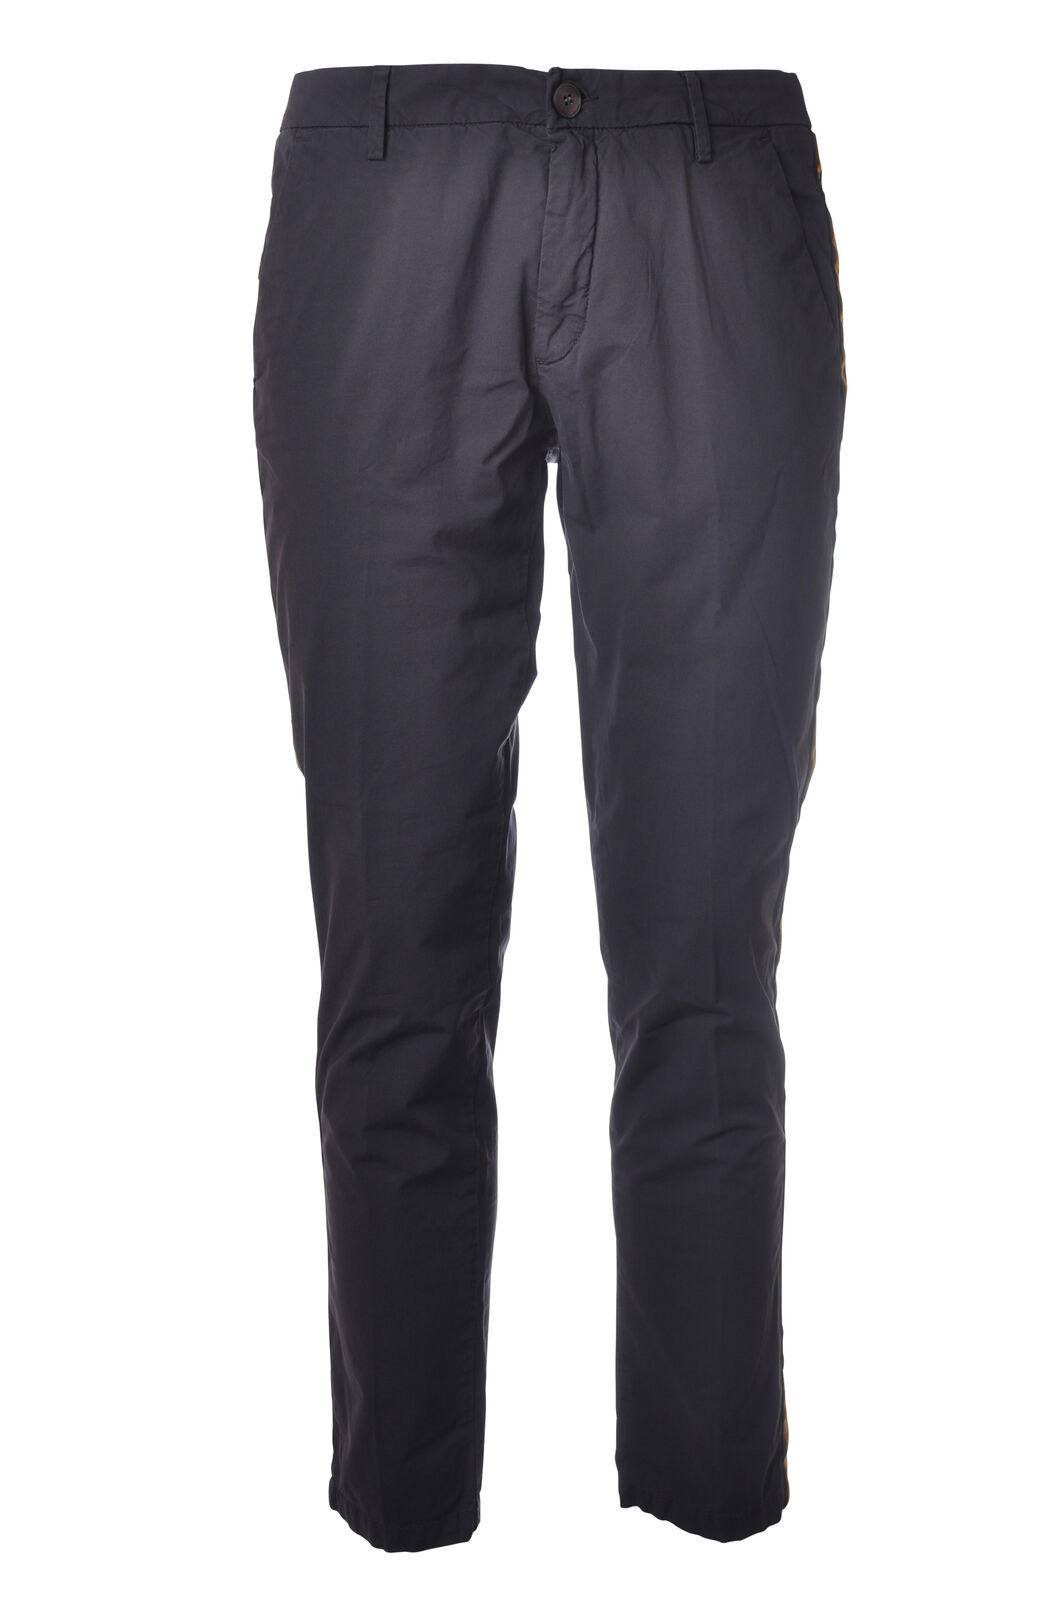 Aglini - Jeans-Pantaloni slim fit - Uomo Uomo Uomo - Grigio - 5298012F182309 0bafbb